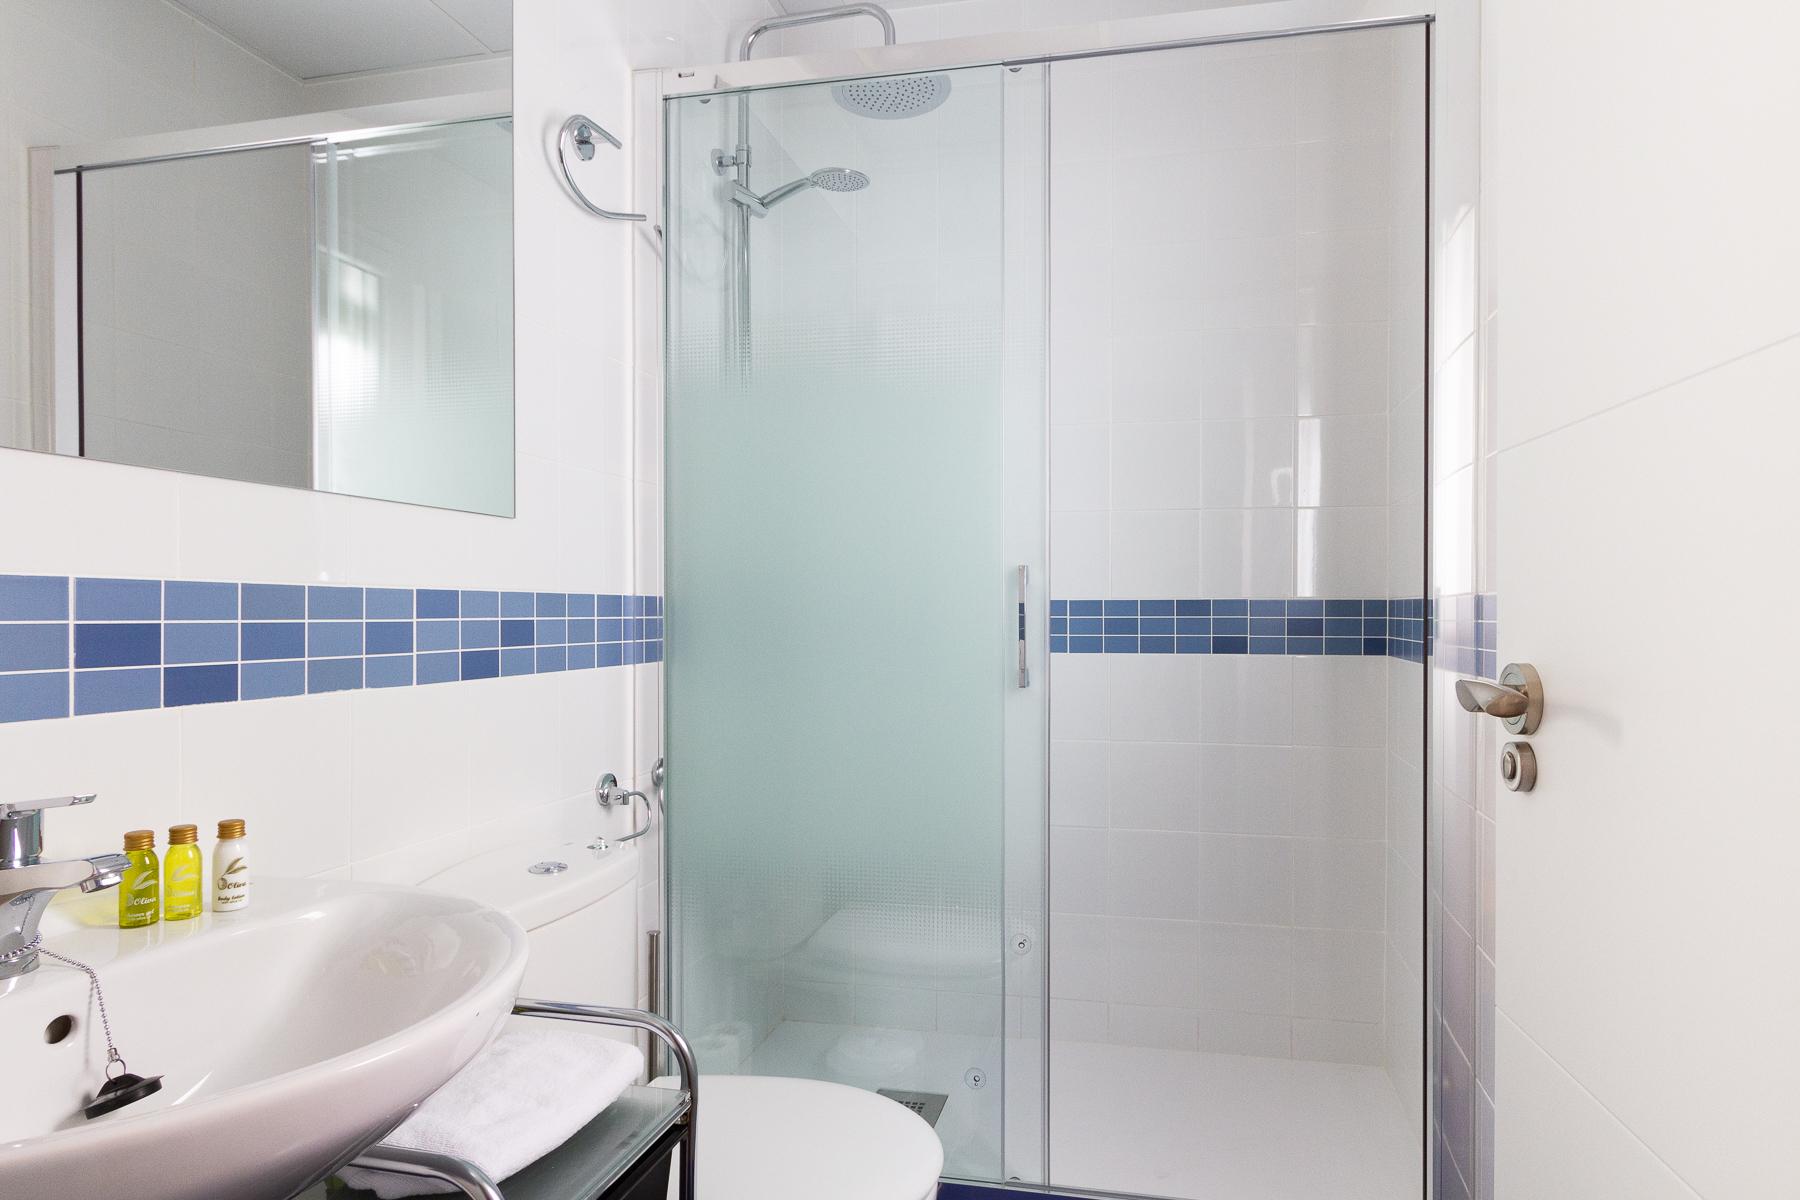 Bathroom at the Calle Ibiza Apartments